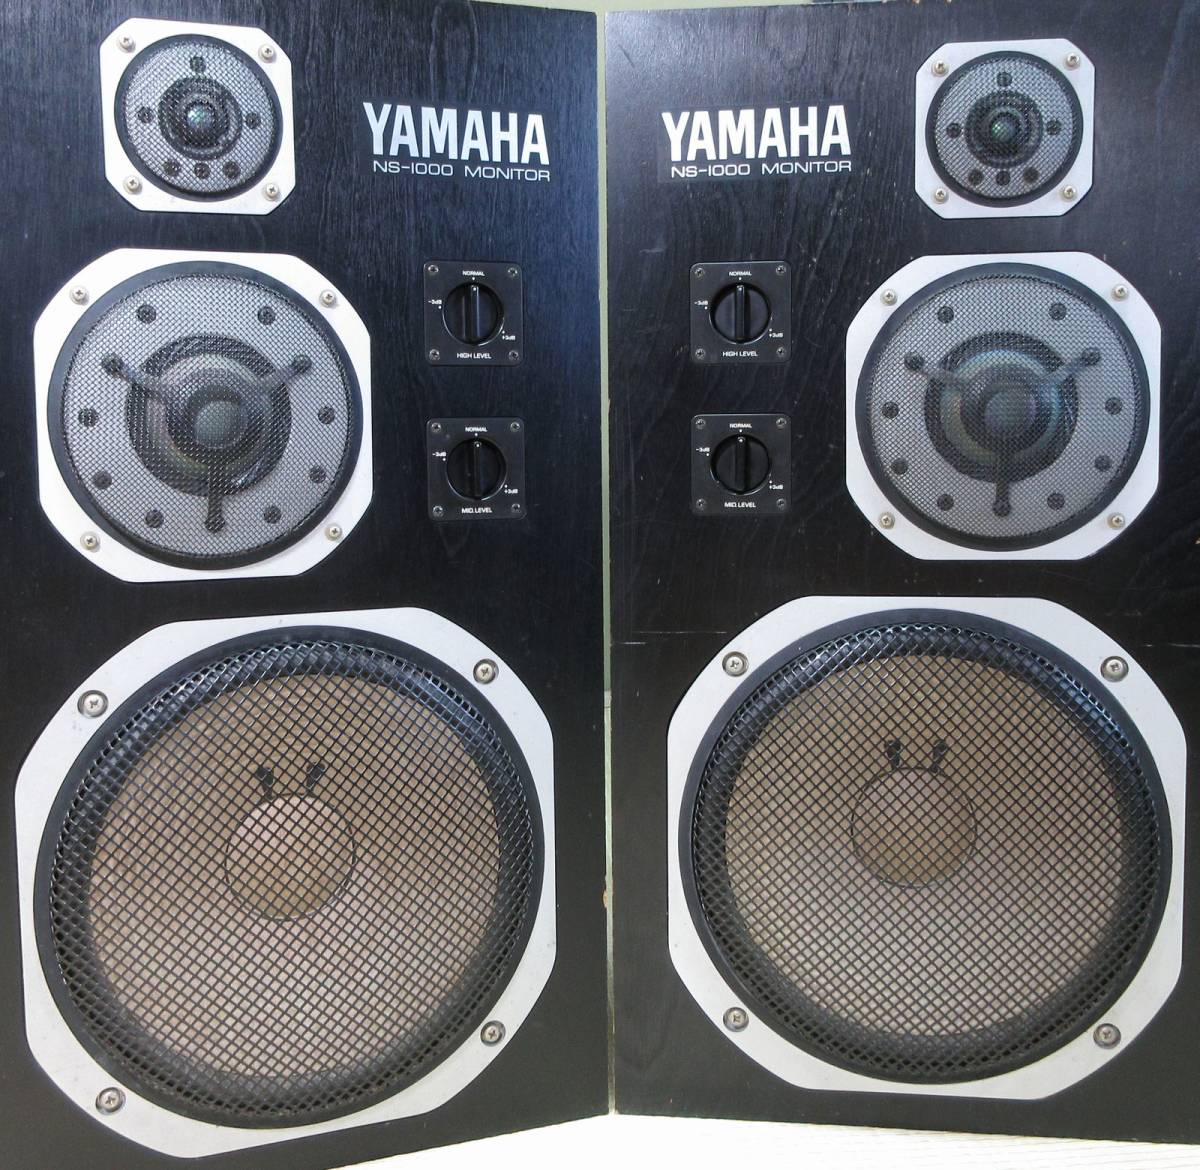 YAMAHA NS-1000M MONITOR スピーカー ペア ヤマハ 北海道引取限定か落札者様による配送会社の手配_画像5